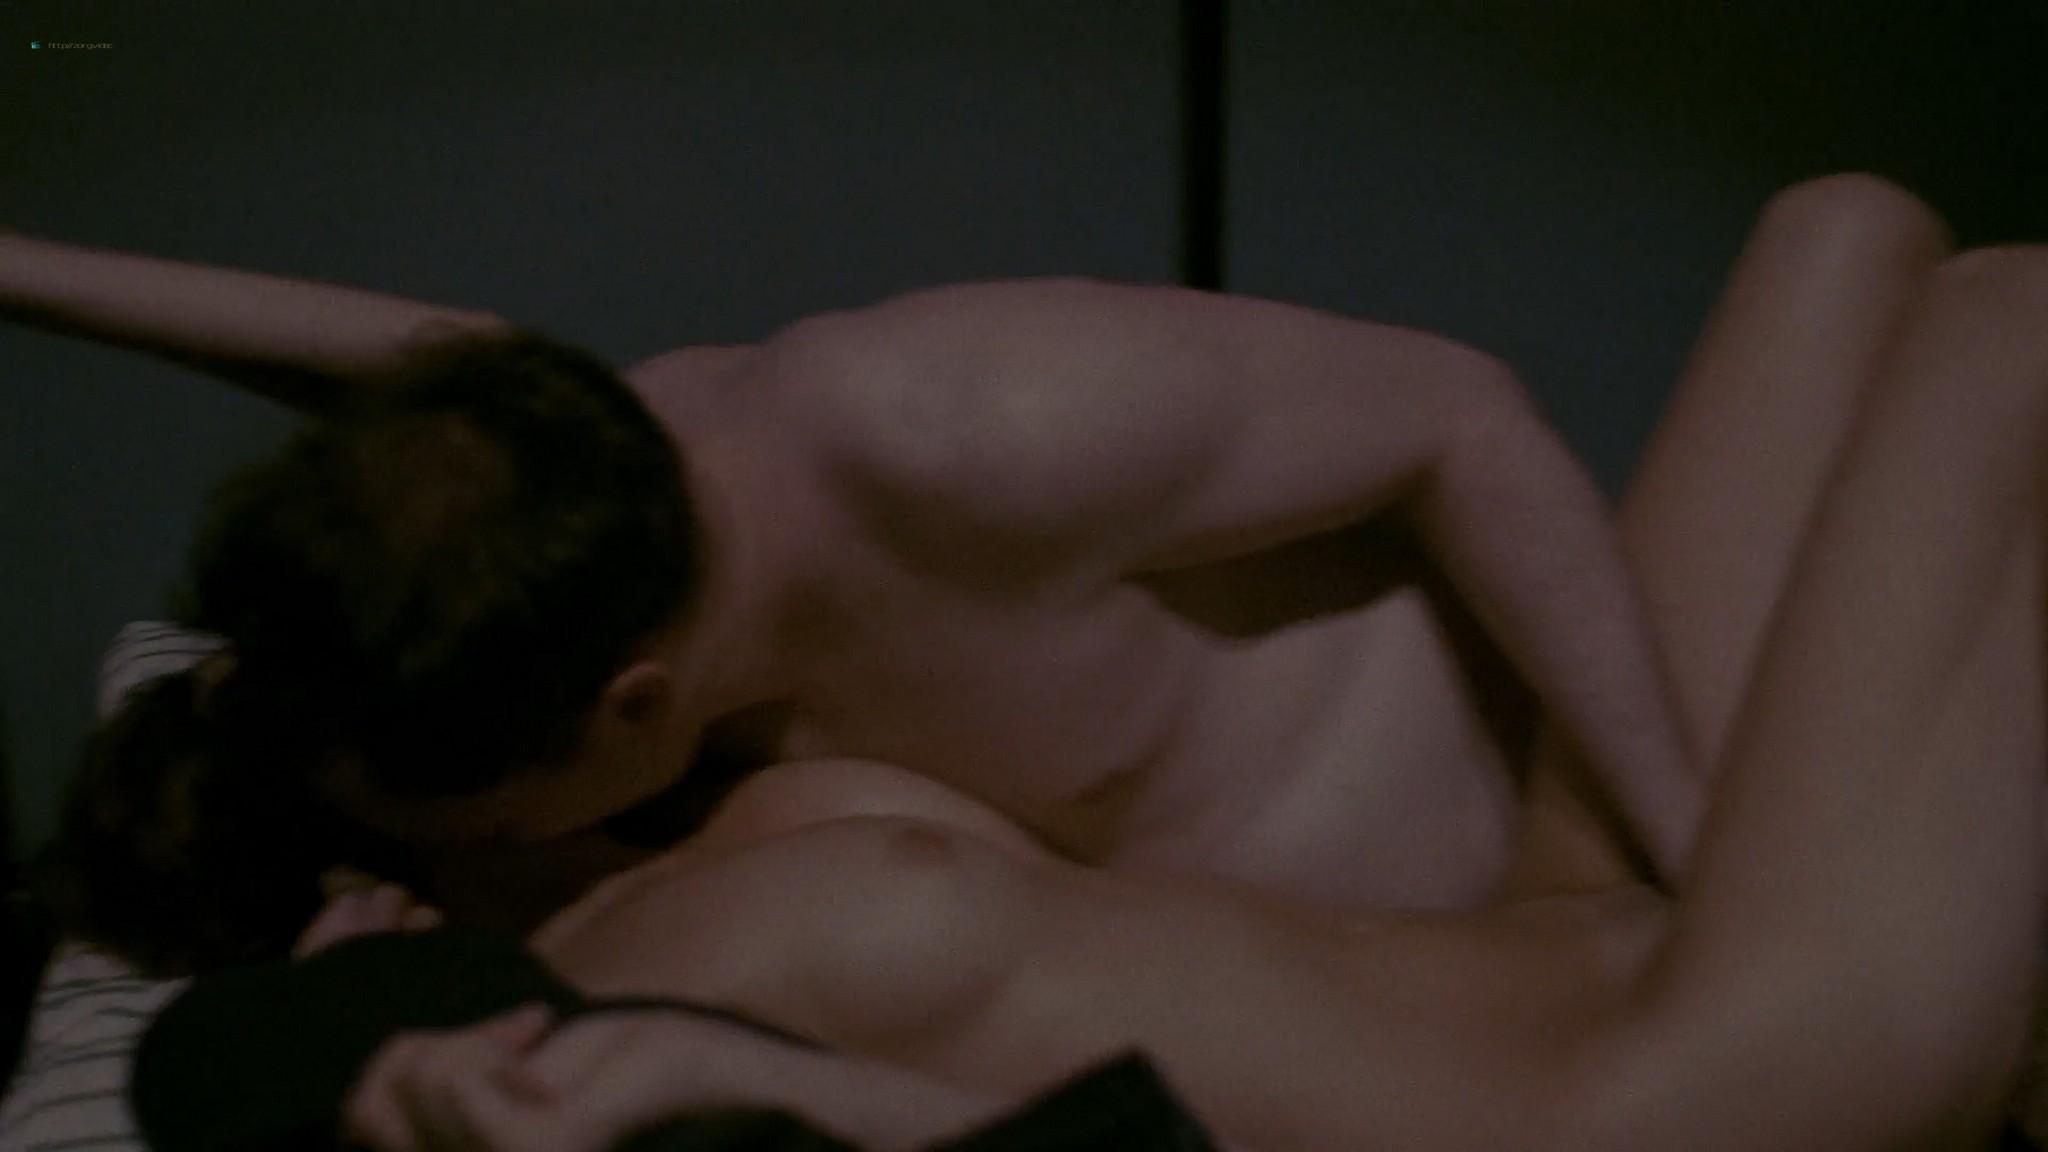 Ekaterina Yuspina nude explicit sex Tatyana Polozhiy, Radmila Shegoleva nude sex too - DAU Katya Tanya (2020) HD 1080p (10)